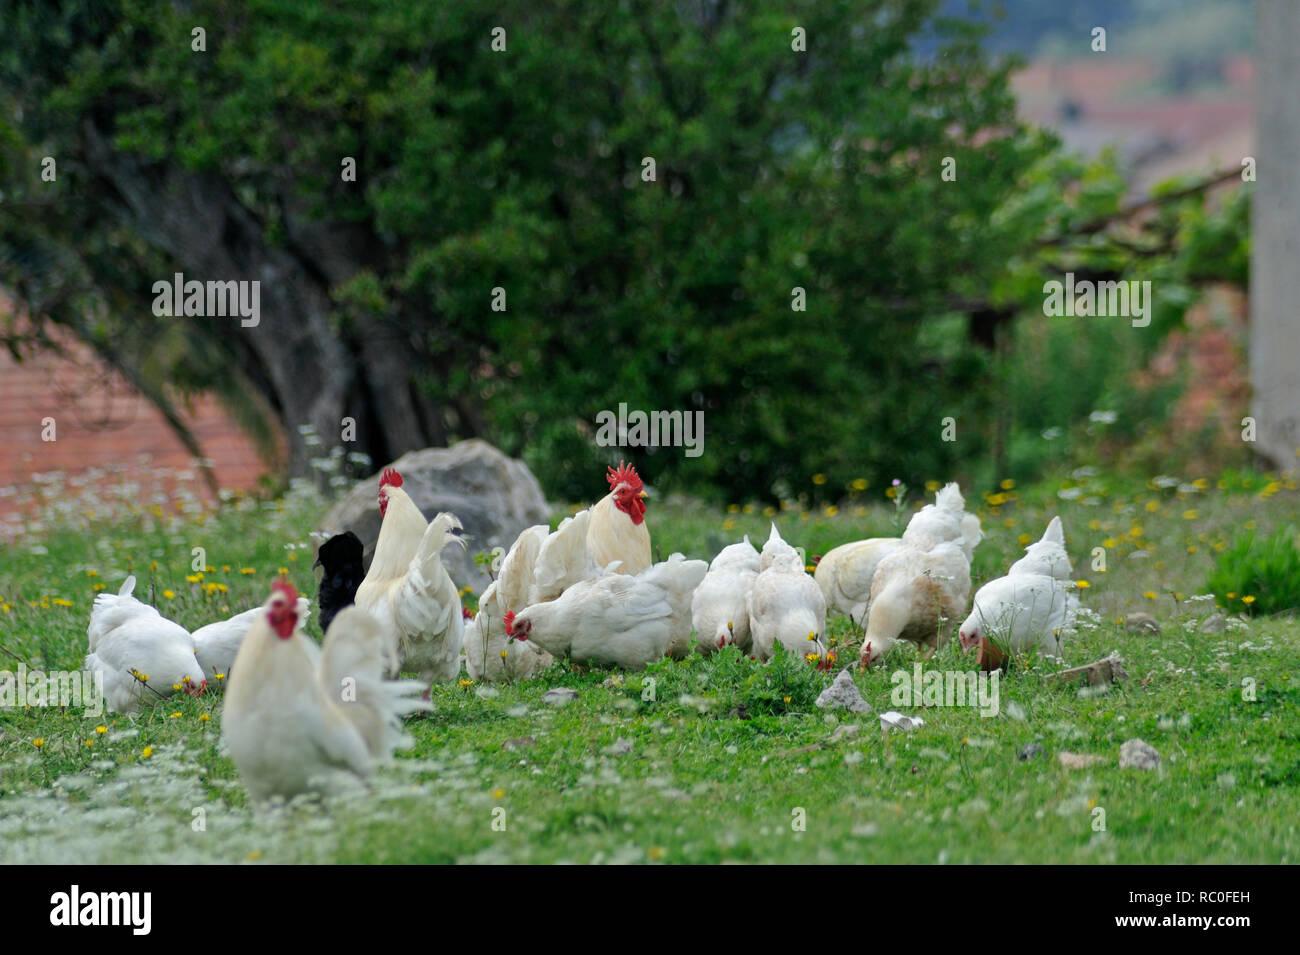 Haushuhn, Gallus gallus f.domesticus, Hühner und Hähne in freier Natur | domestic fowl, Gallus gallus f. domesticus, poultry in natural surroundings - Stock Image